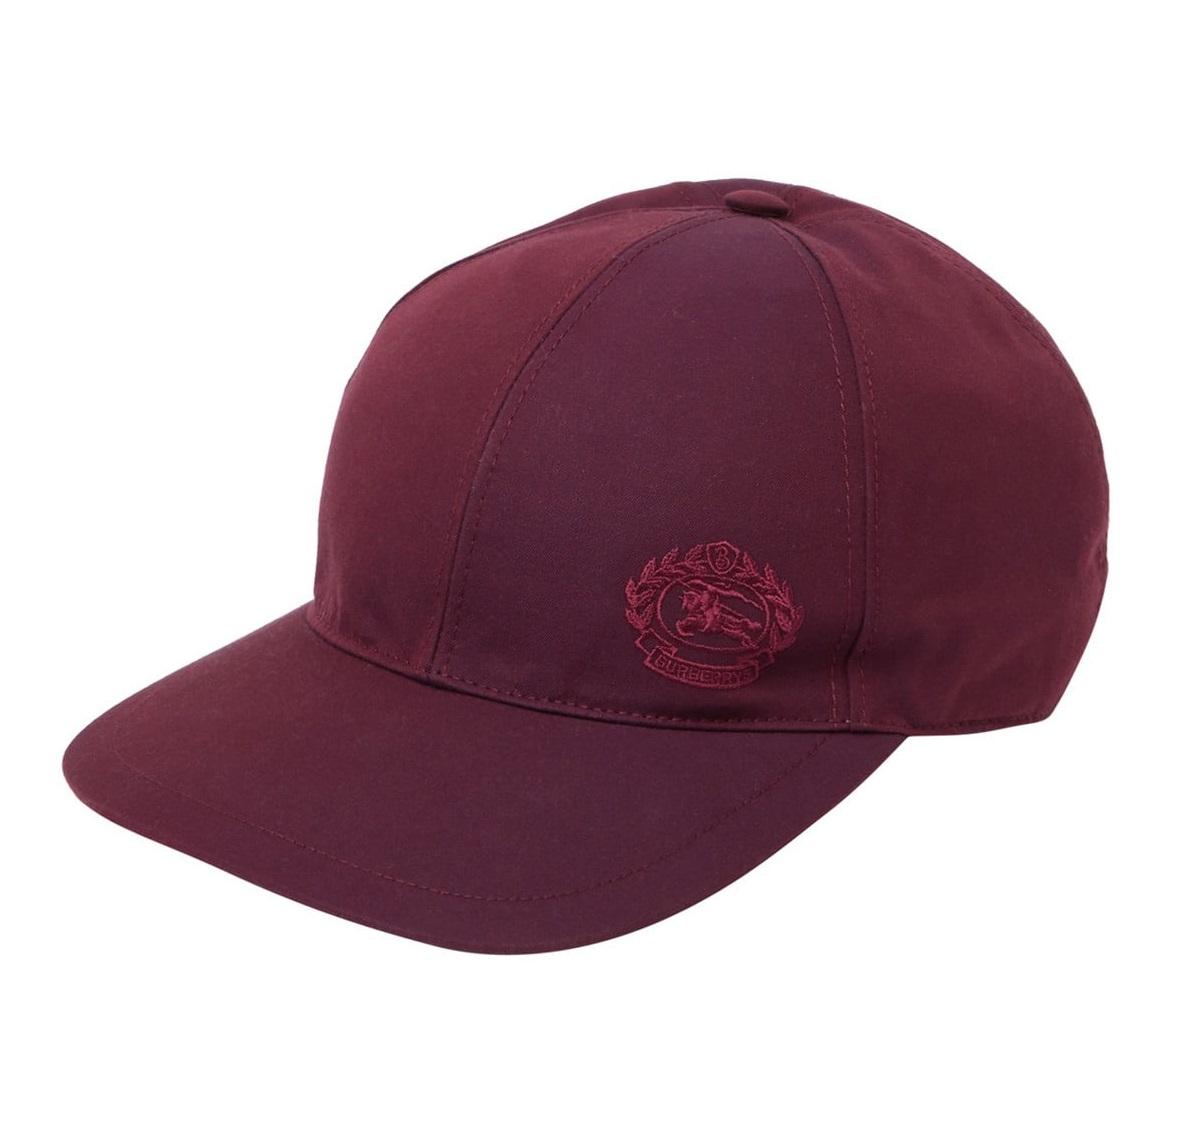 Burberry Alh Dk Logo Crest Cap In Boysenberry In Red